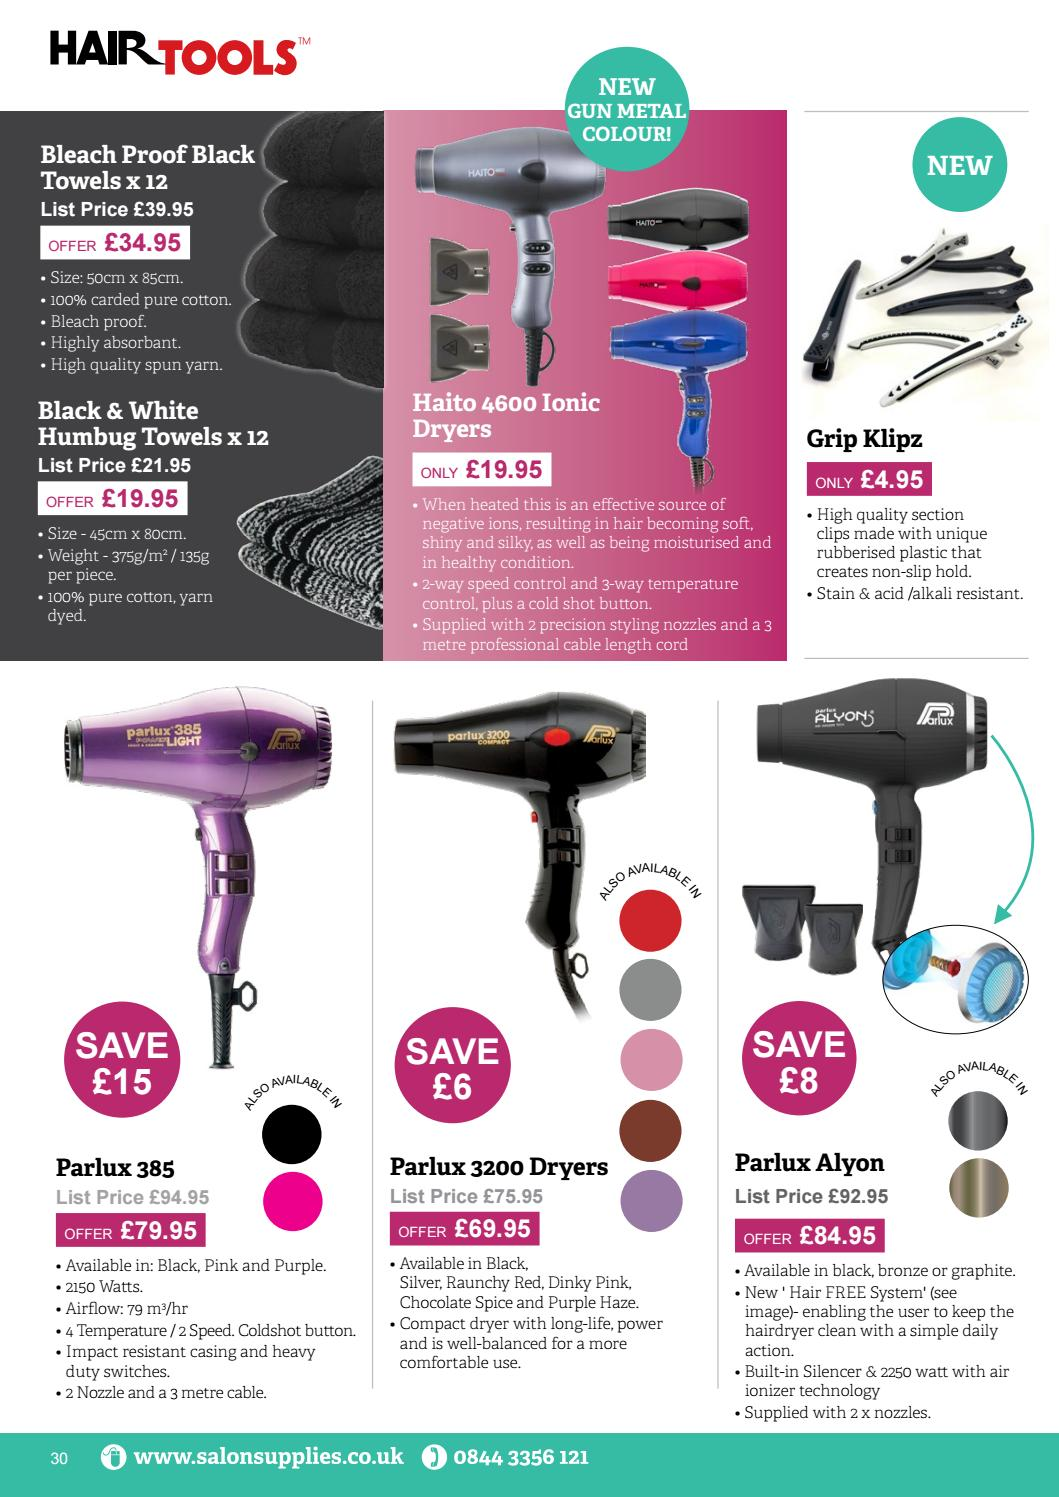 Haito 4600 Ionic Black Hair Dryer